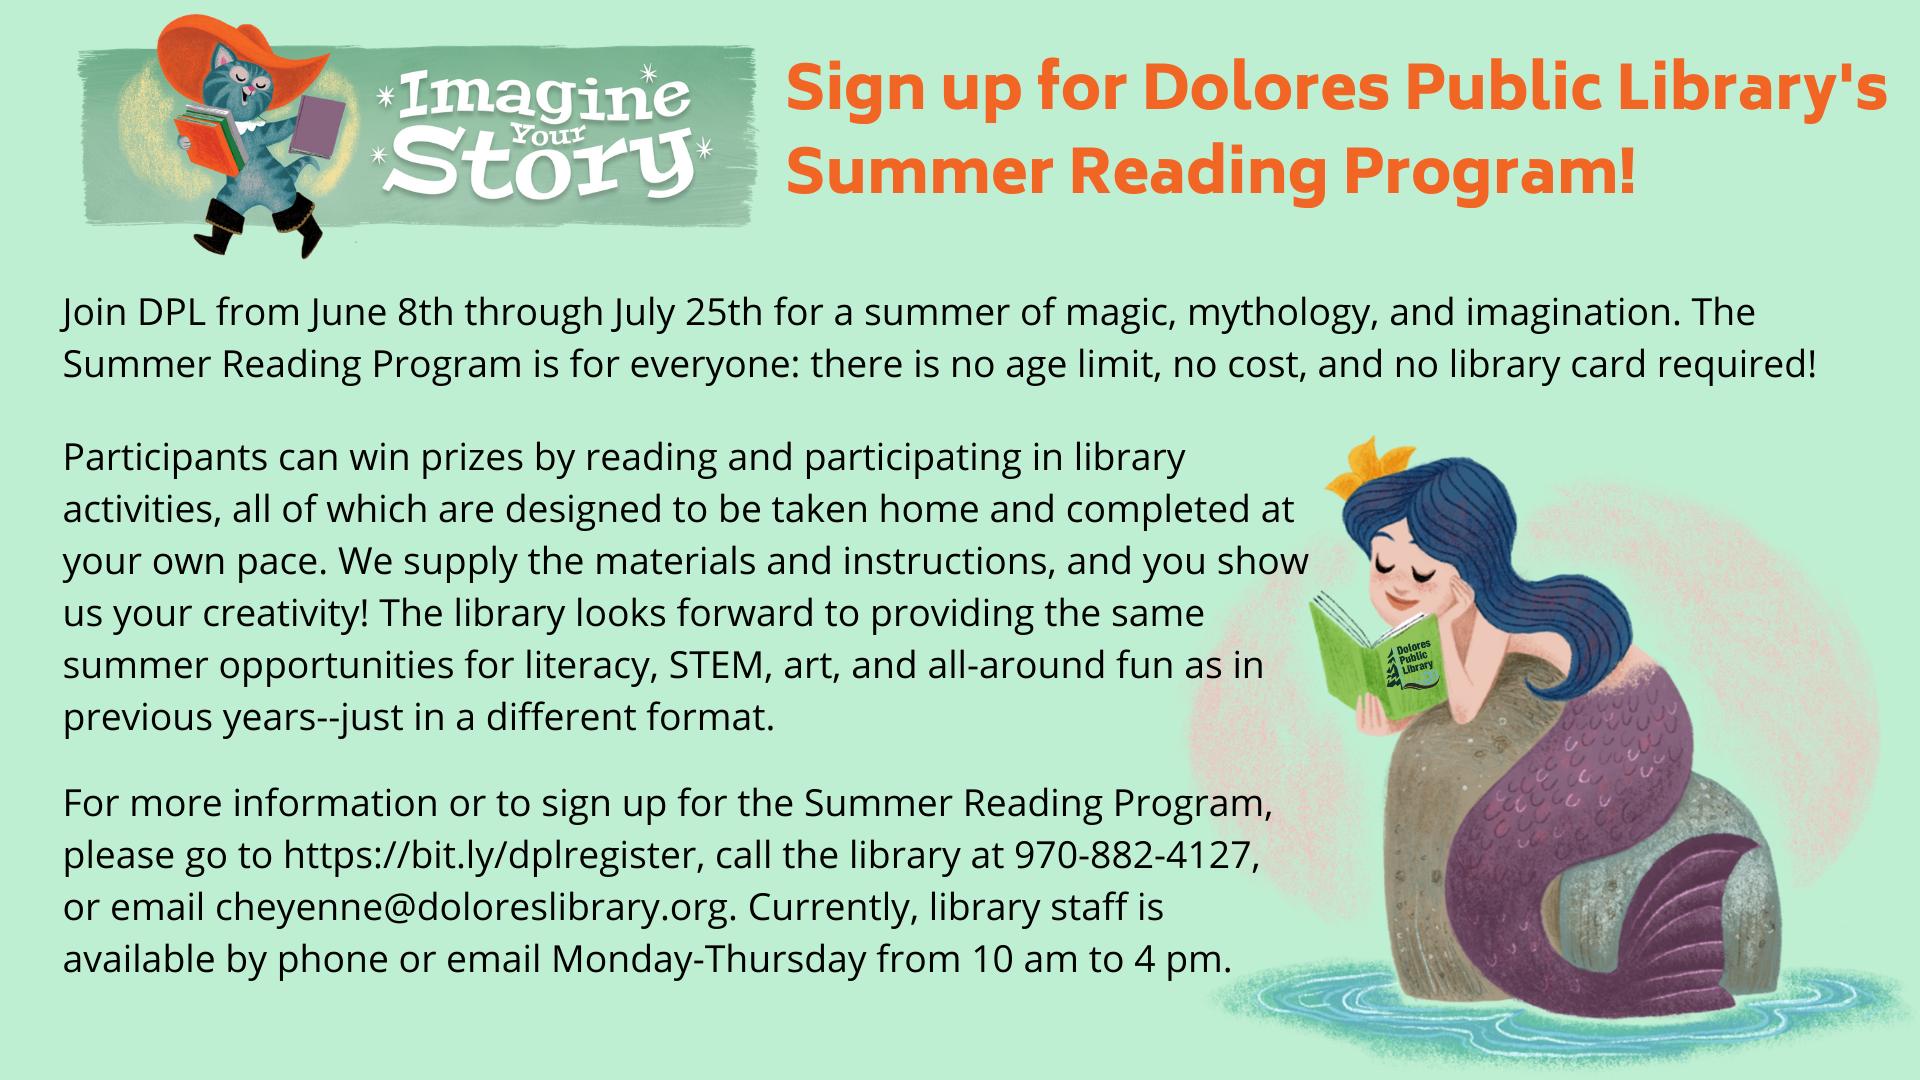 Summer Reading Program 2020 Dolores Public Library 1920x1080